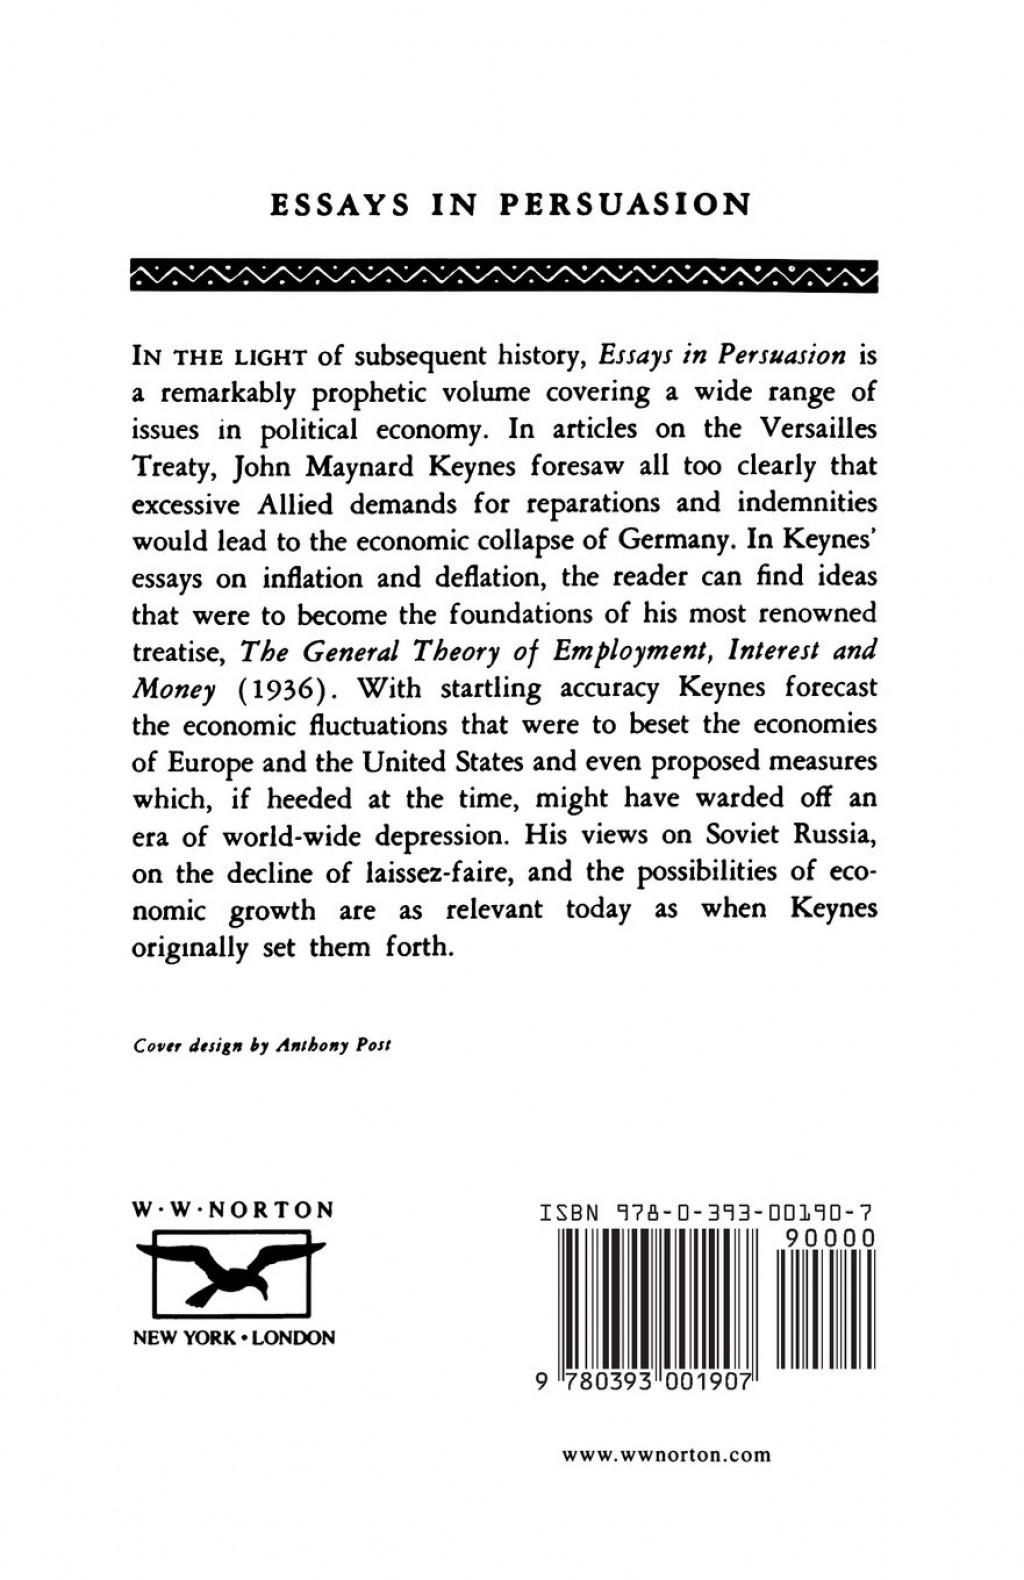 011 Essays In Persuasion 71ahgmsw 0l Essay Remarkable Audiobook Pdf John Maynard Keynes Summary Large